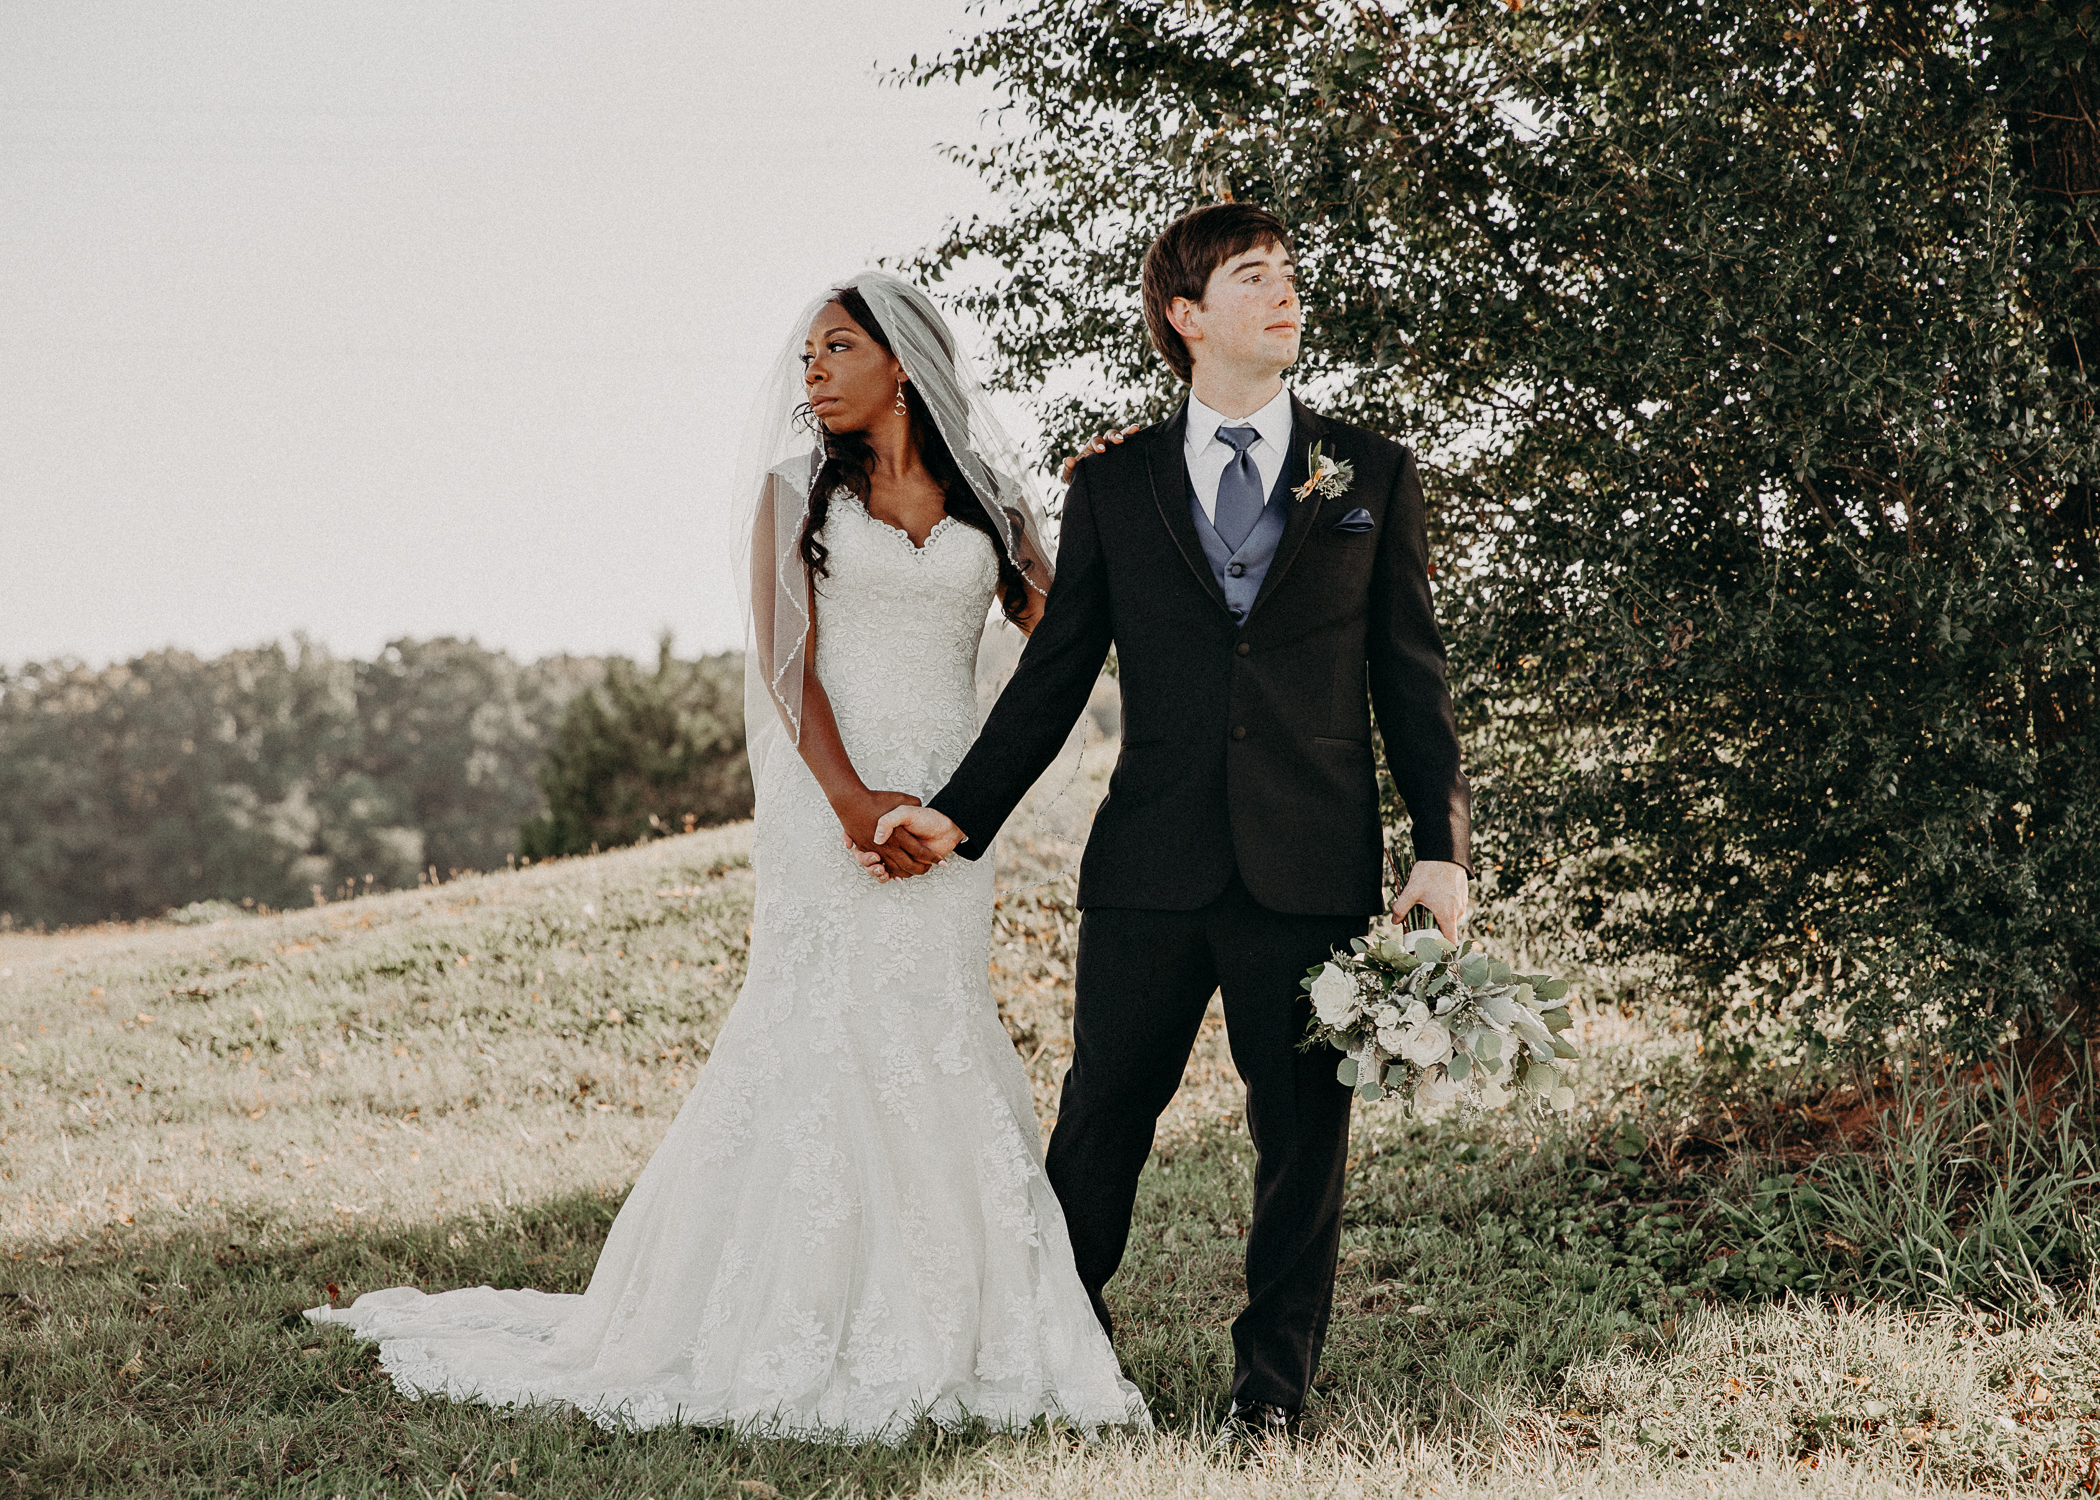 38- Wedding_day_atlanta_georgia_Bride_and_groom_first_look_and_portraits_aline_marin_photography.jpg